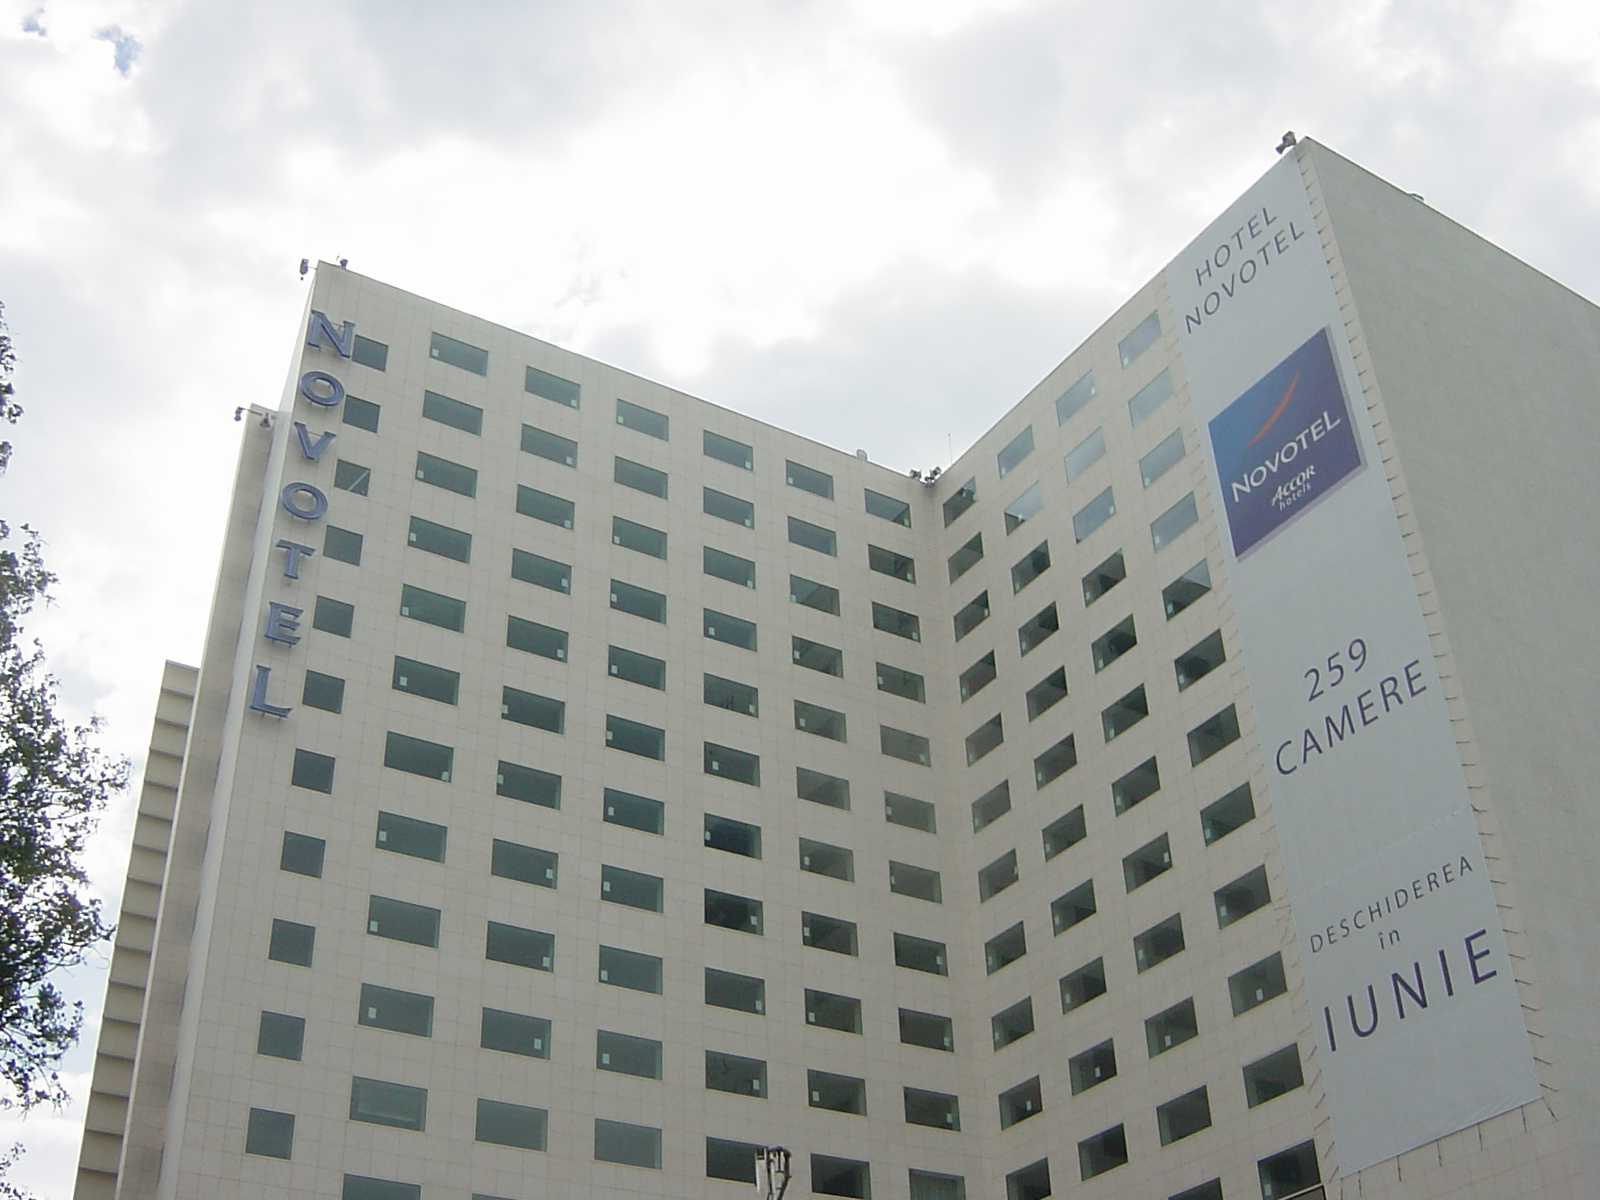 Sistem de iluminare - Hotel Novotel CARALUX - Poza 1